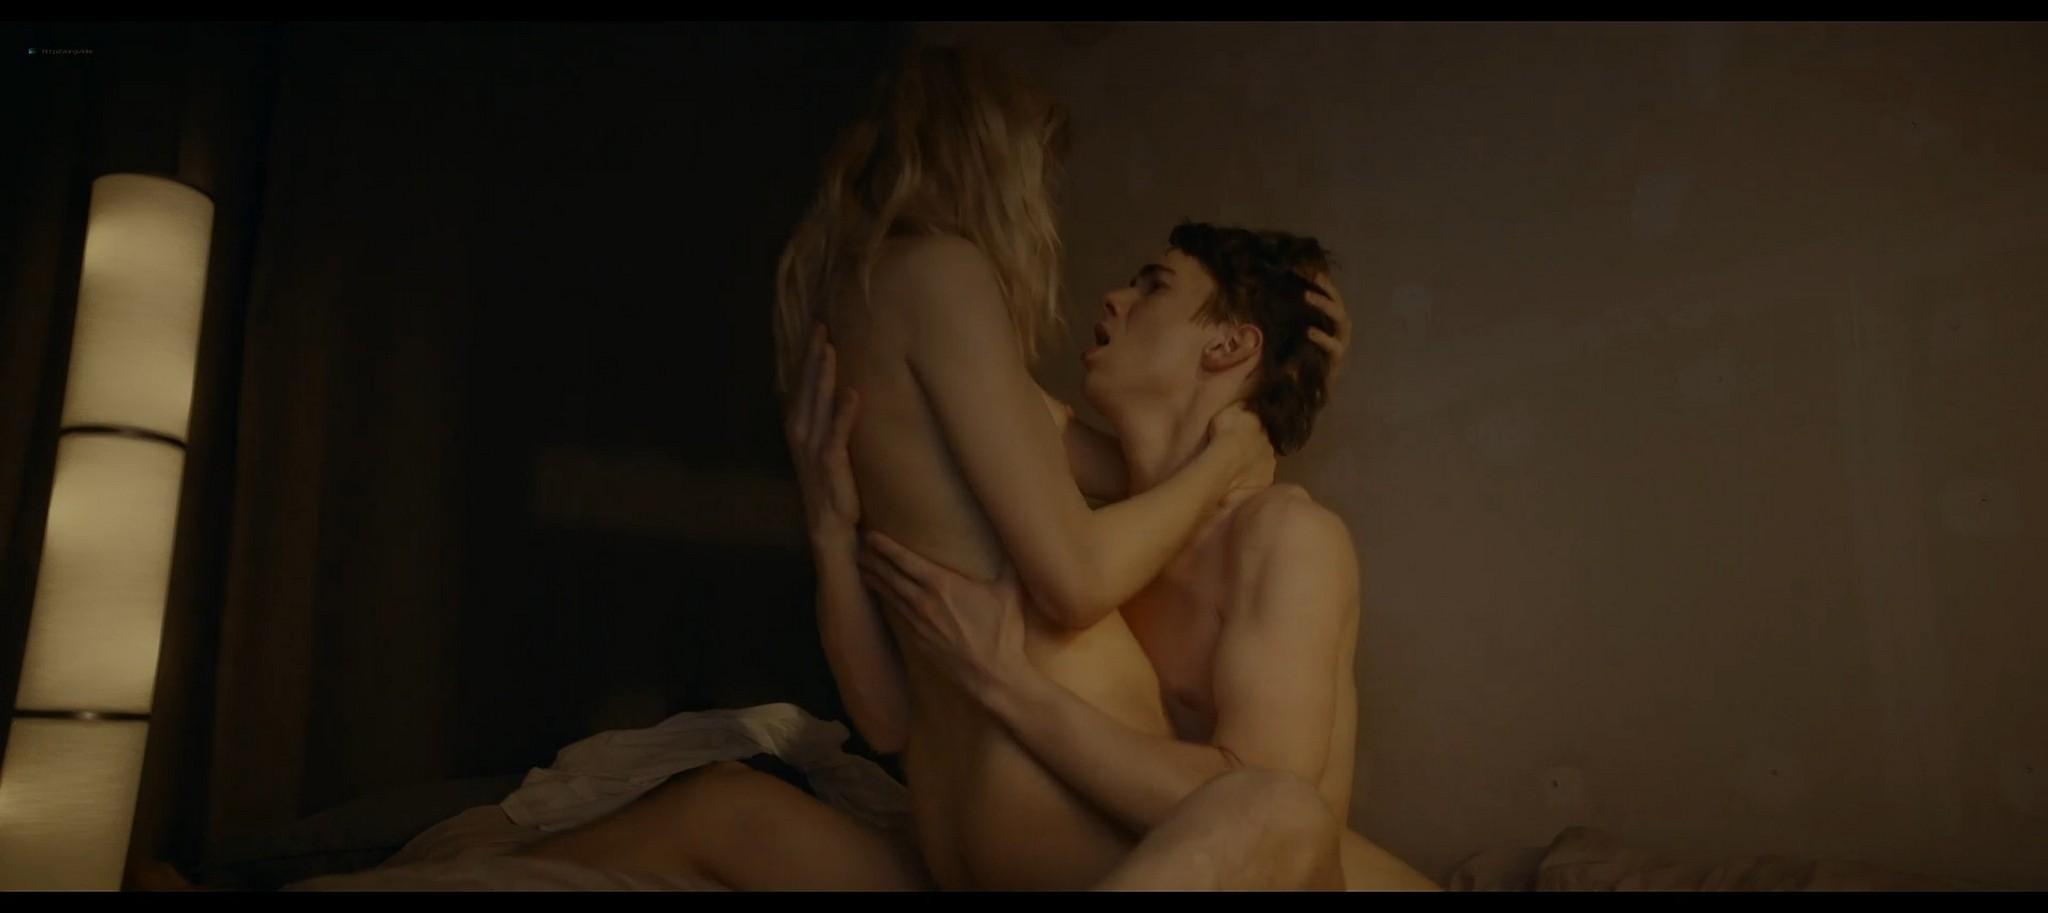 Lena Tronina nude and hot sex Happy End RU 2021 S1e3 4 1080p Web 13